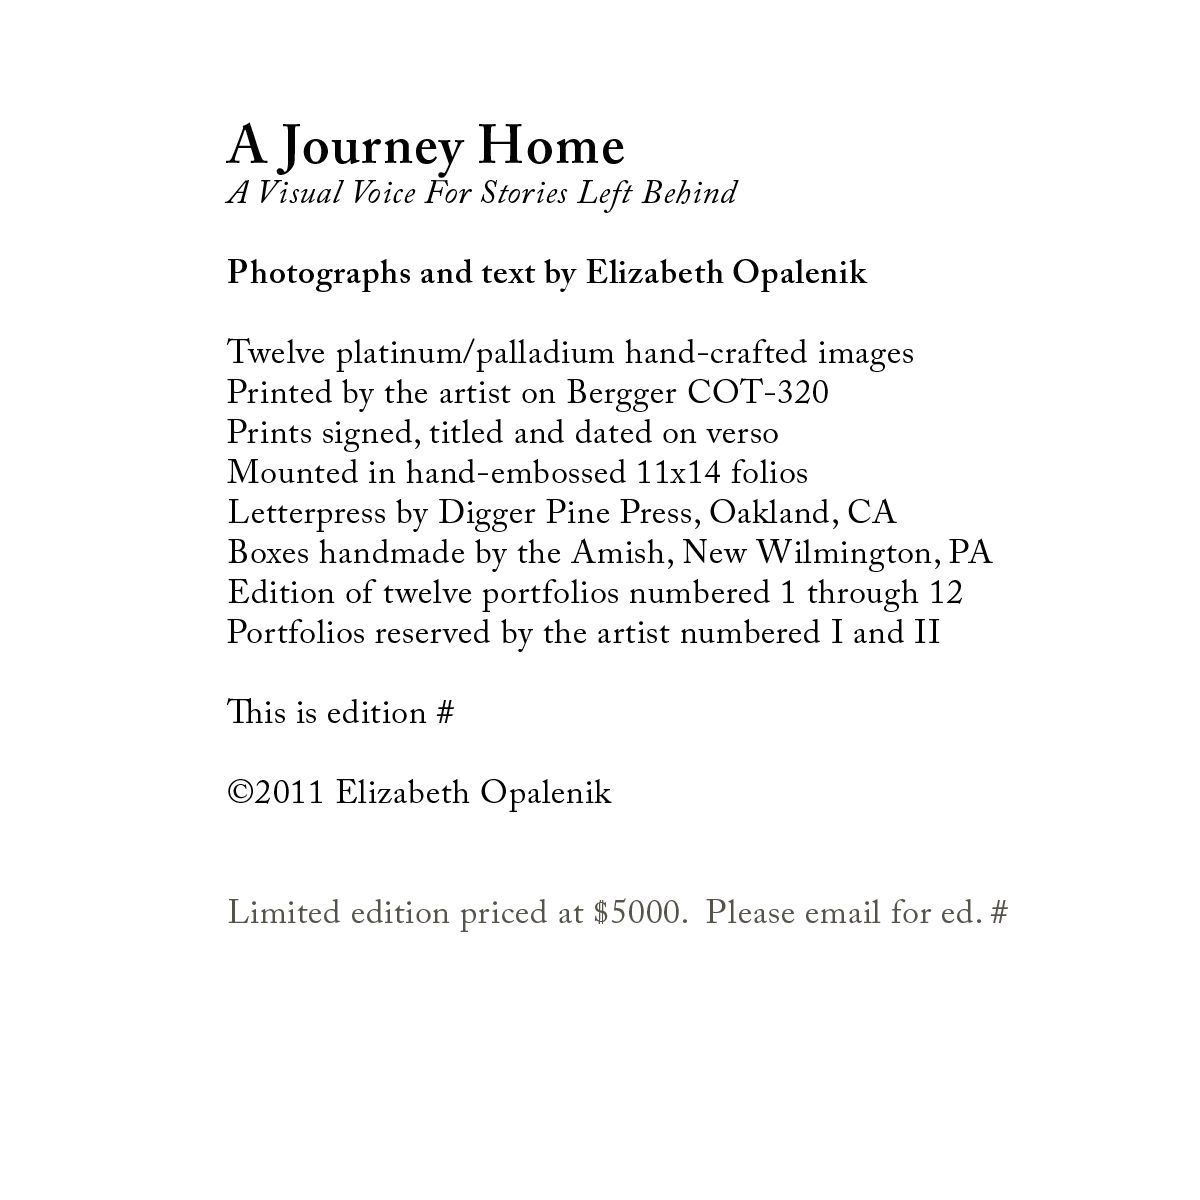 1final_journey_home_credits.jpg